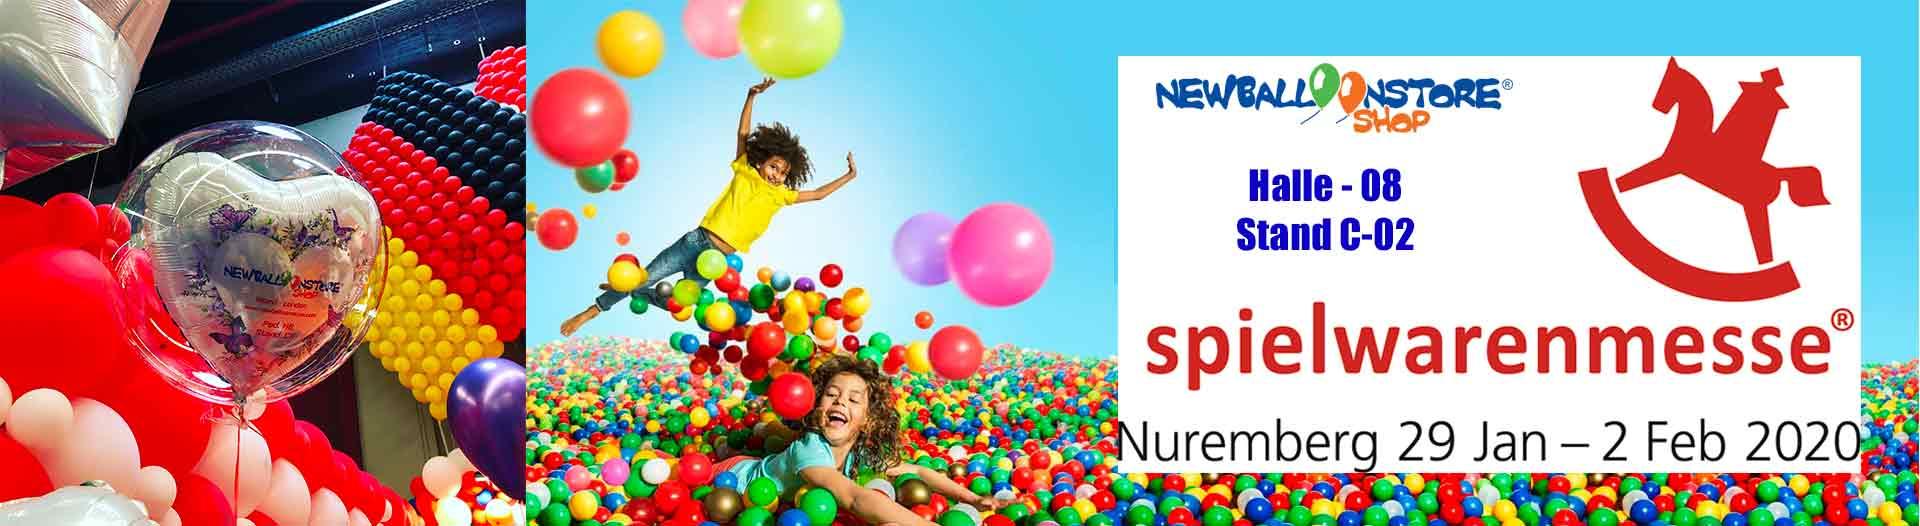 spielwarenmesse-newballoonstore-2020